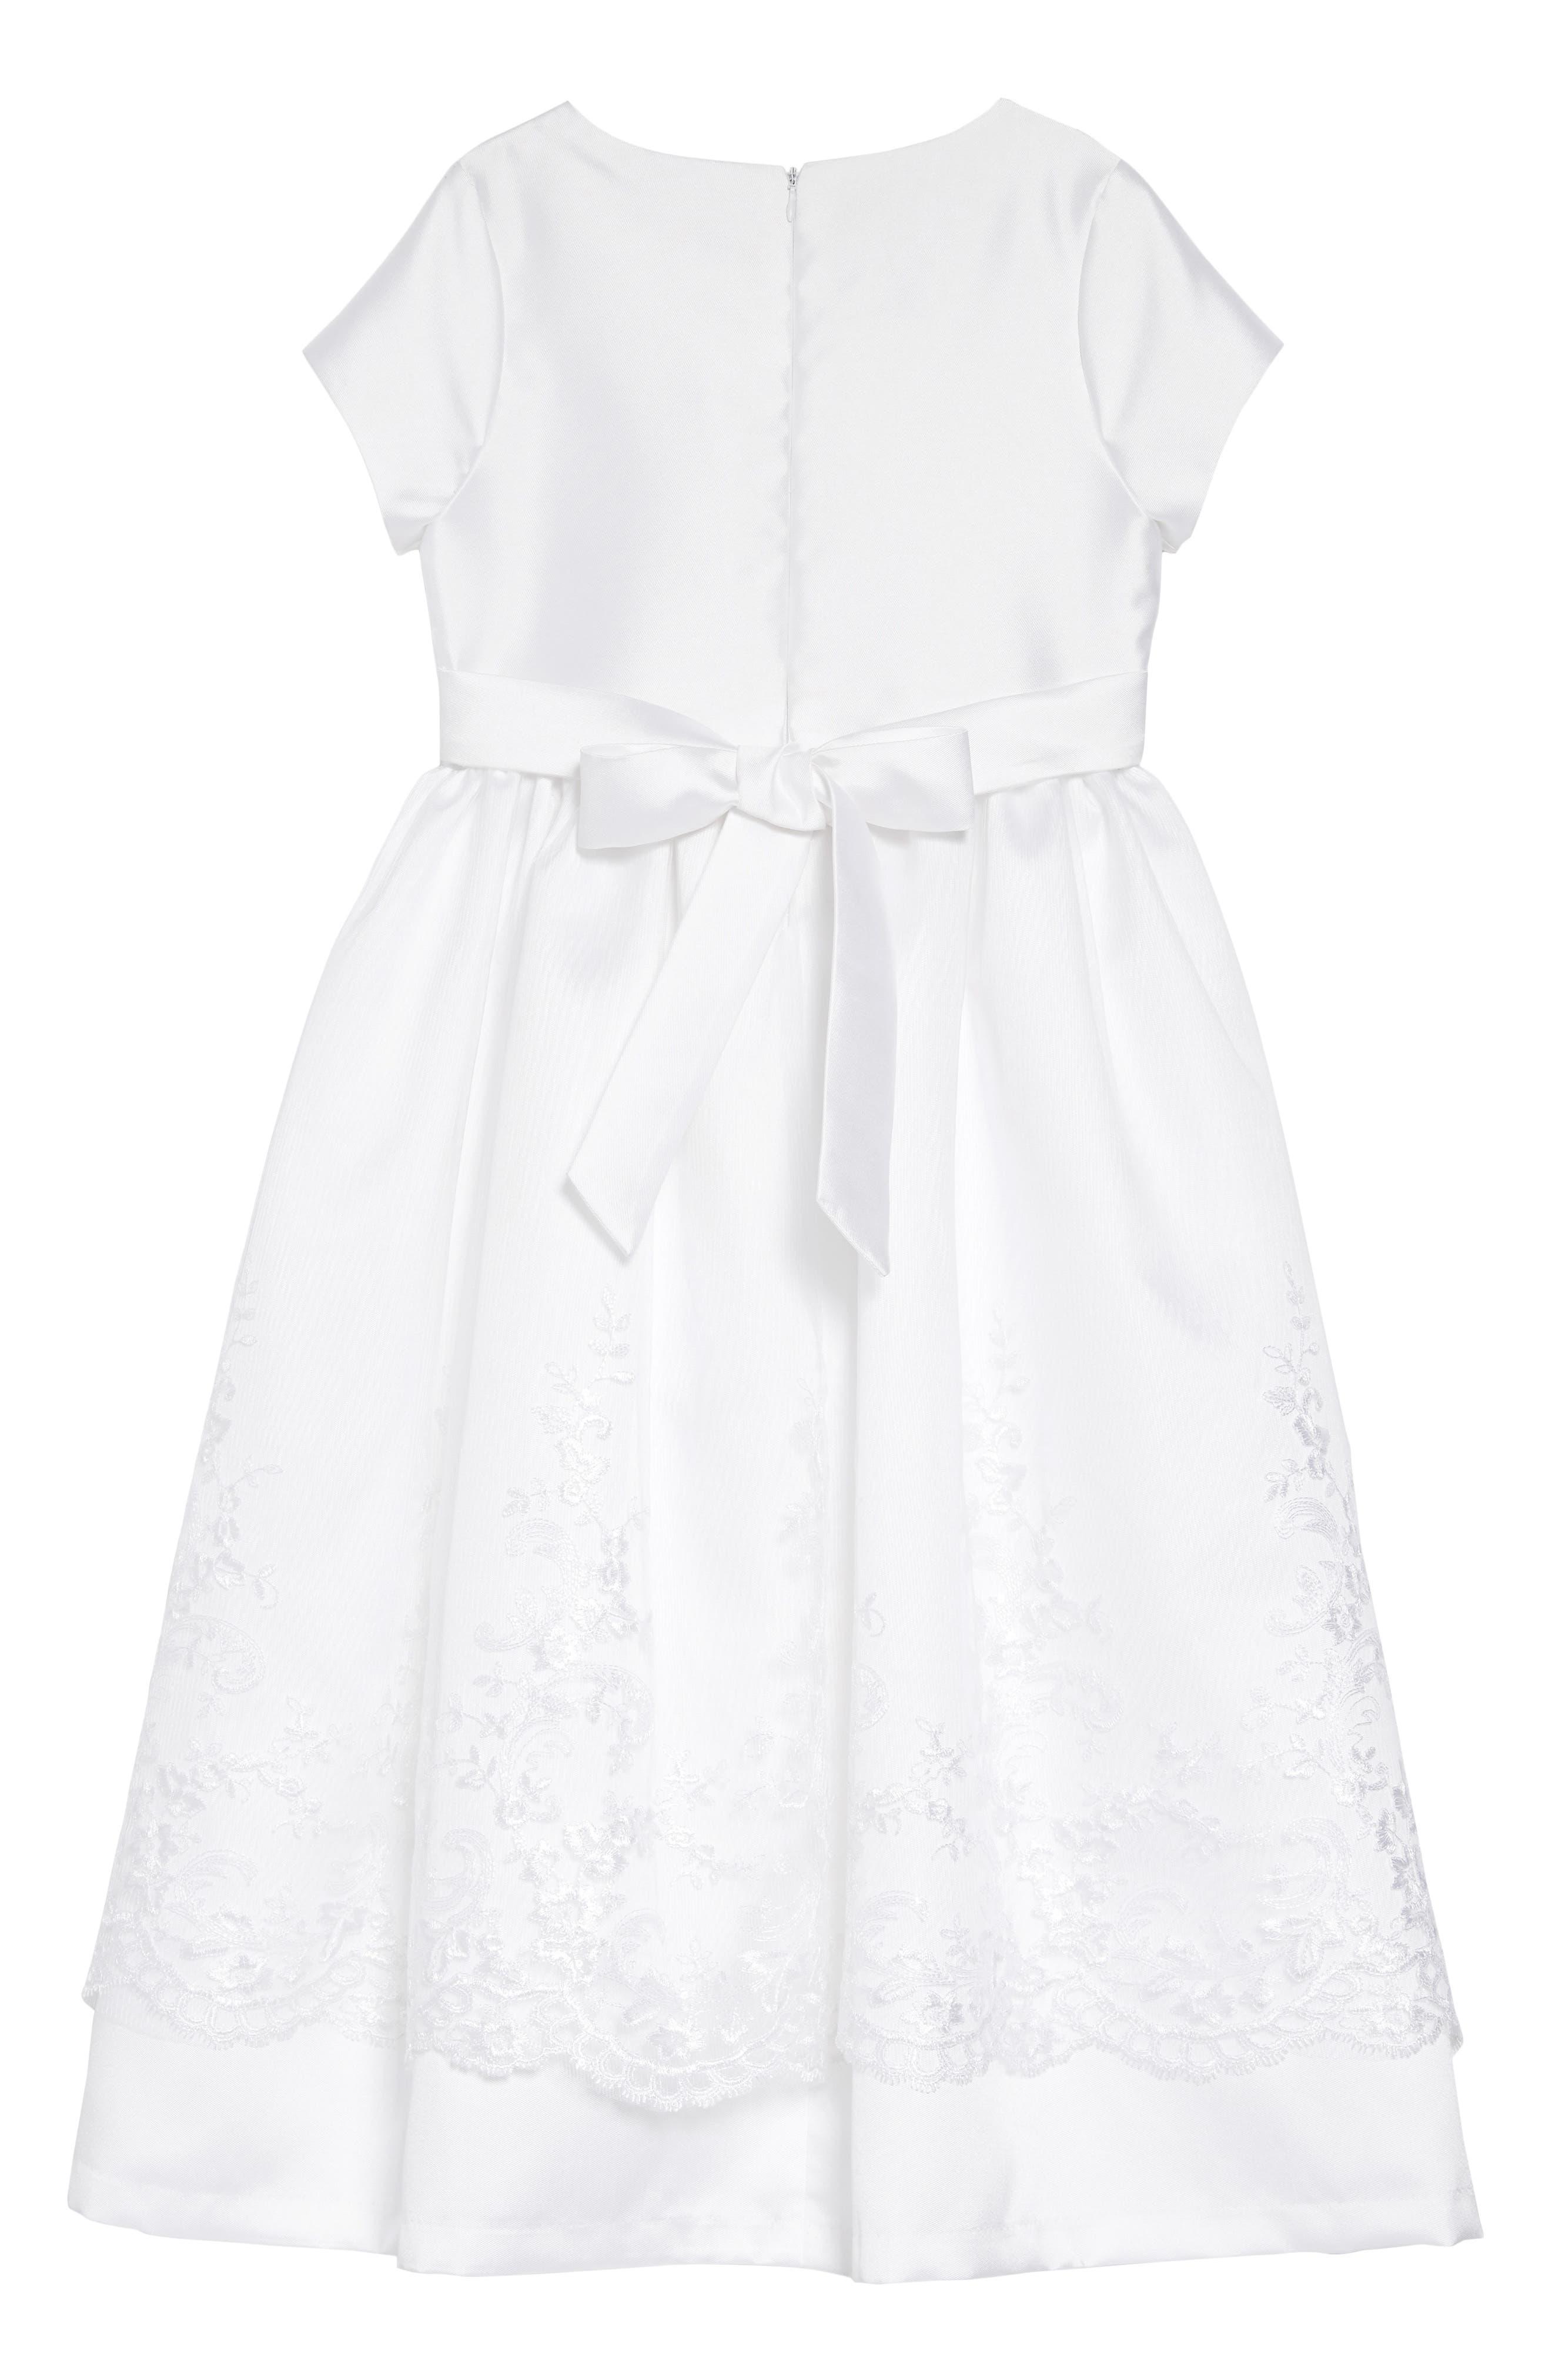 IRIS & IVY, Sweetheart Mikado Dress, Alternate thumbnail 2, color, WHITE